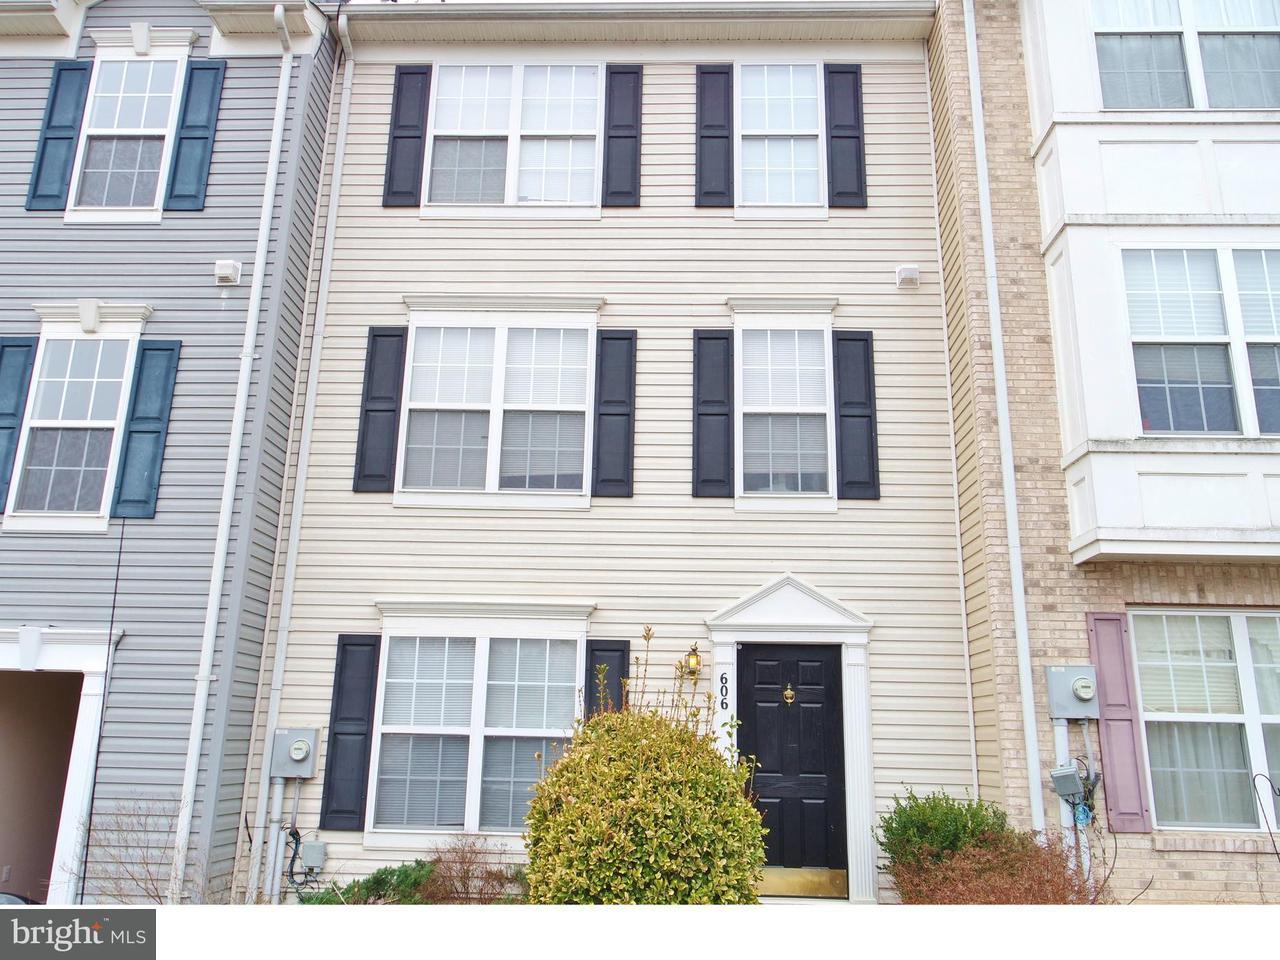 Other Residential for Rent at 606 Pendleton Ln Strasburg, Virginia 22657 United States